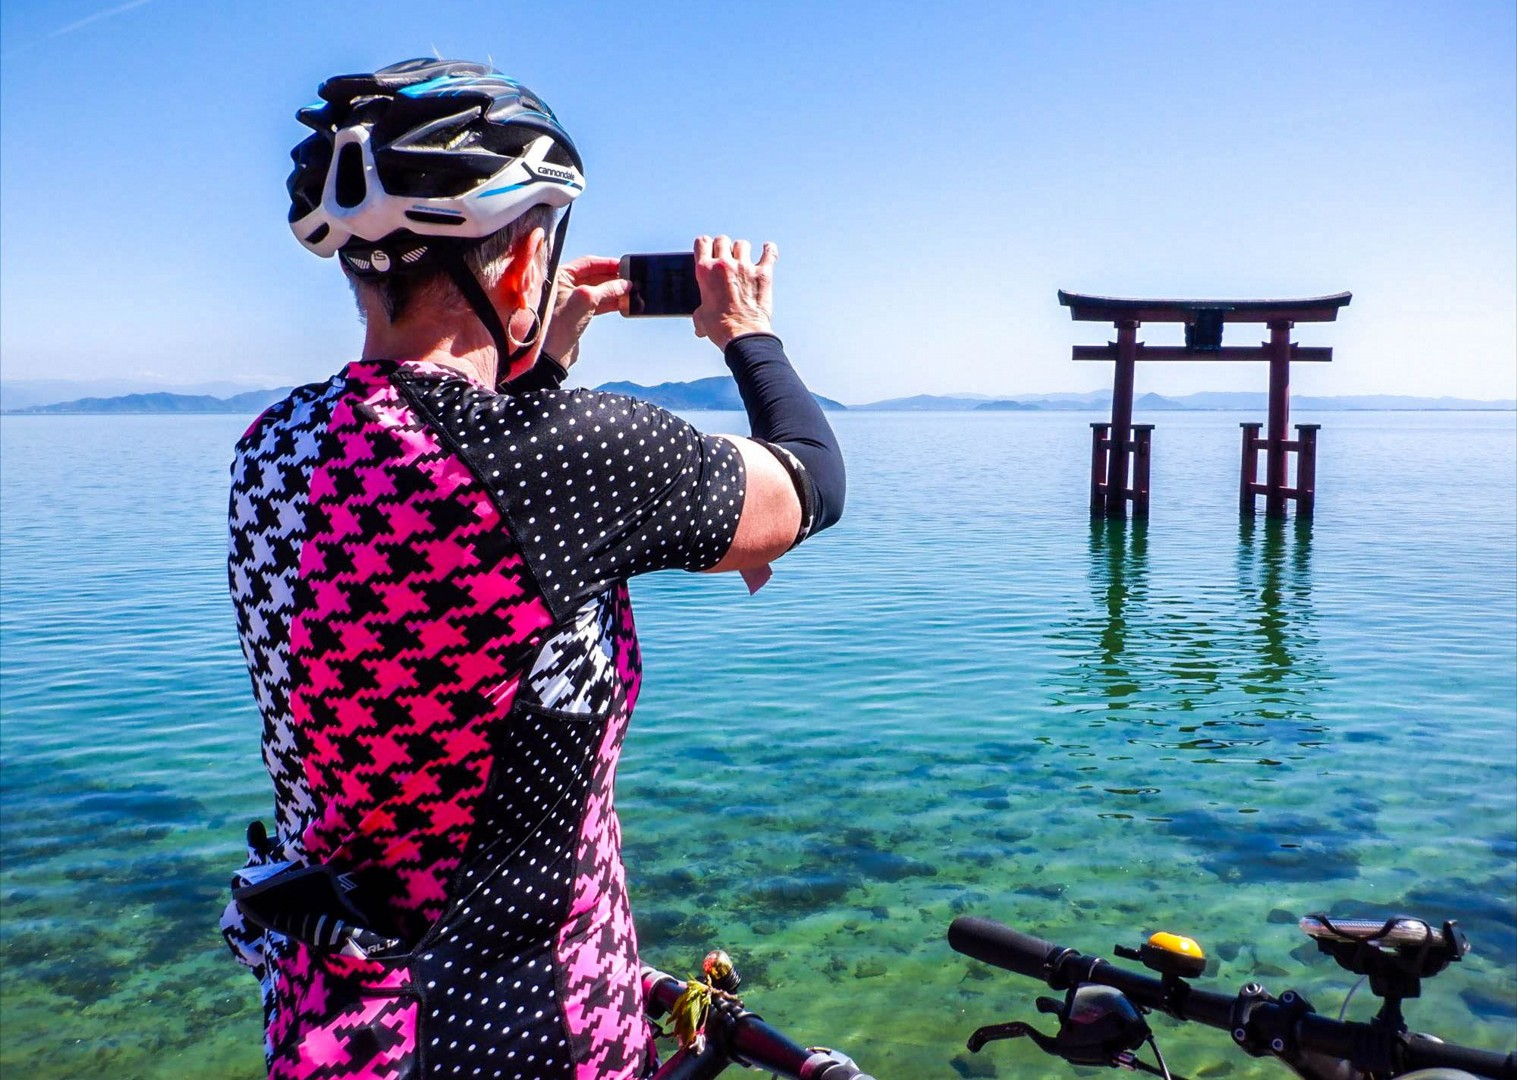 taka_20_apr_DSCF1595.jpg - Japan - Classic Japan - Fuji to Kyoto - Cycling Holiday - Cycling Adventures